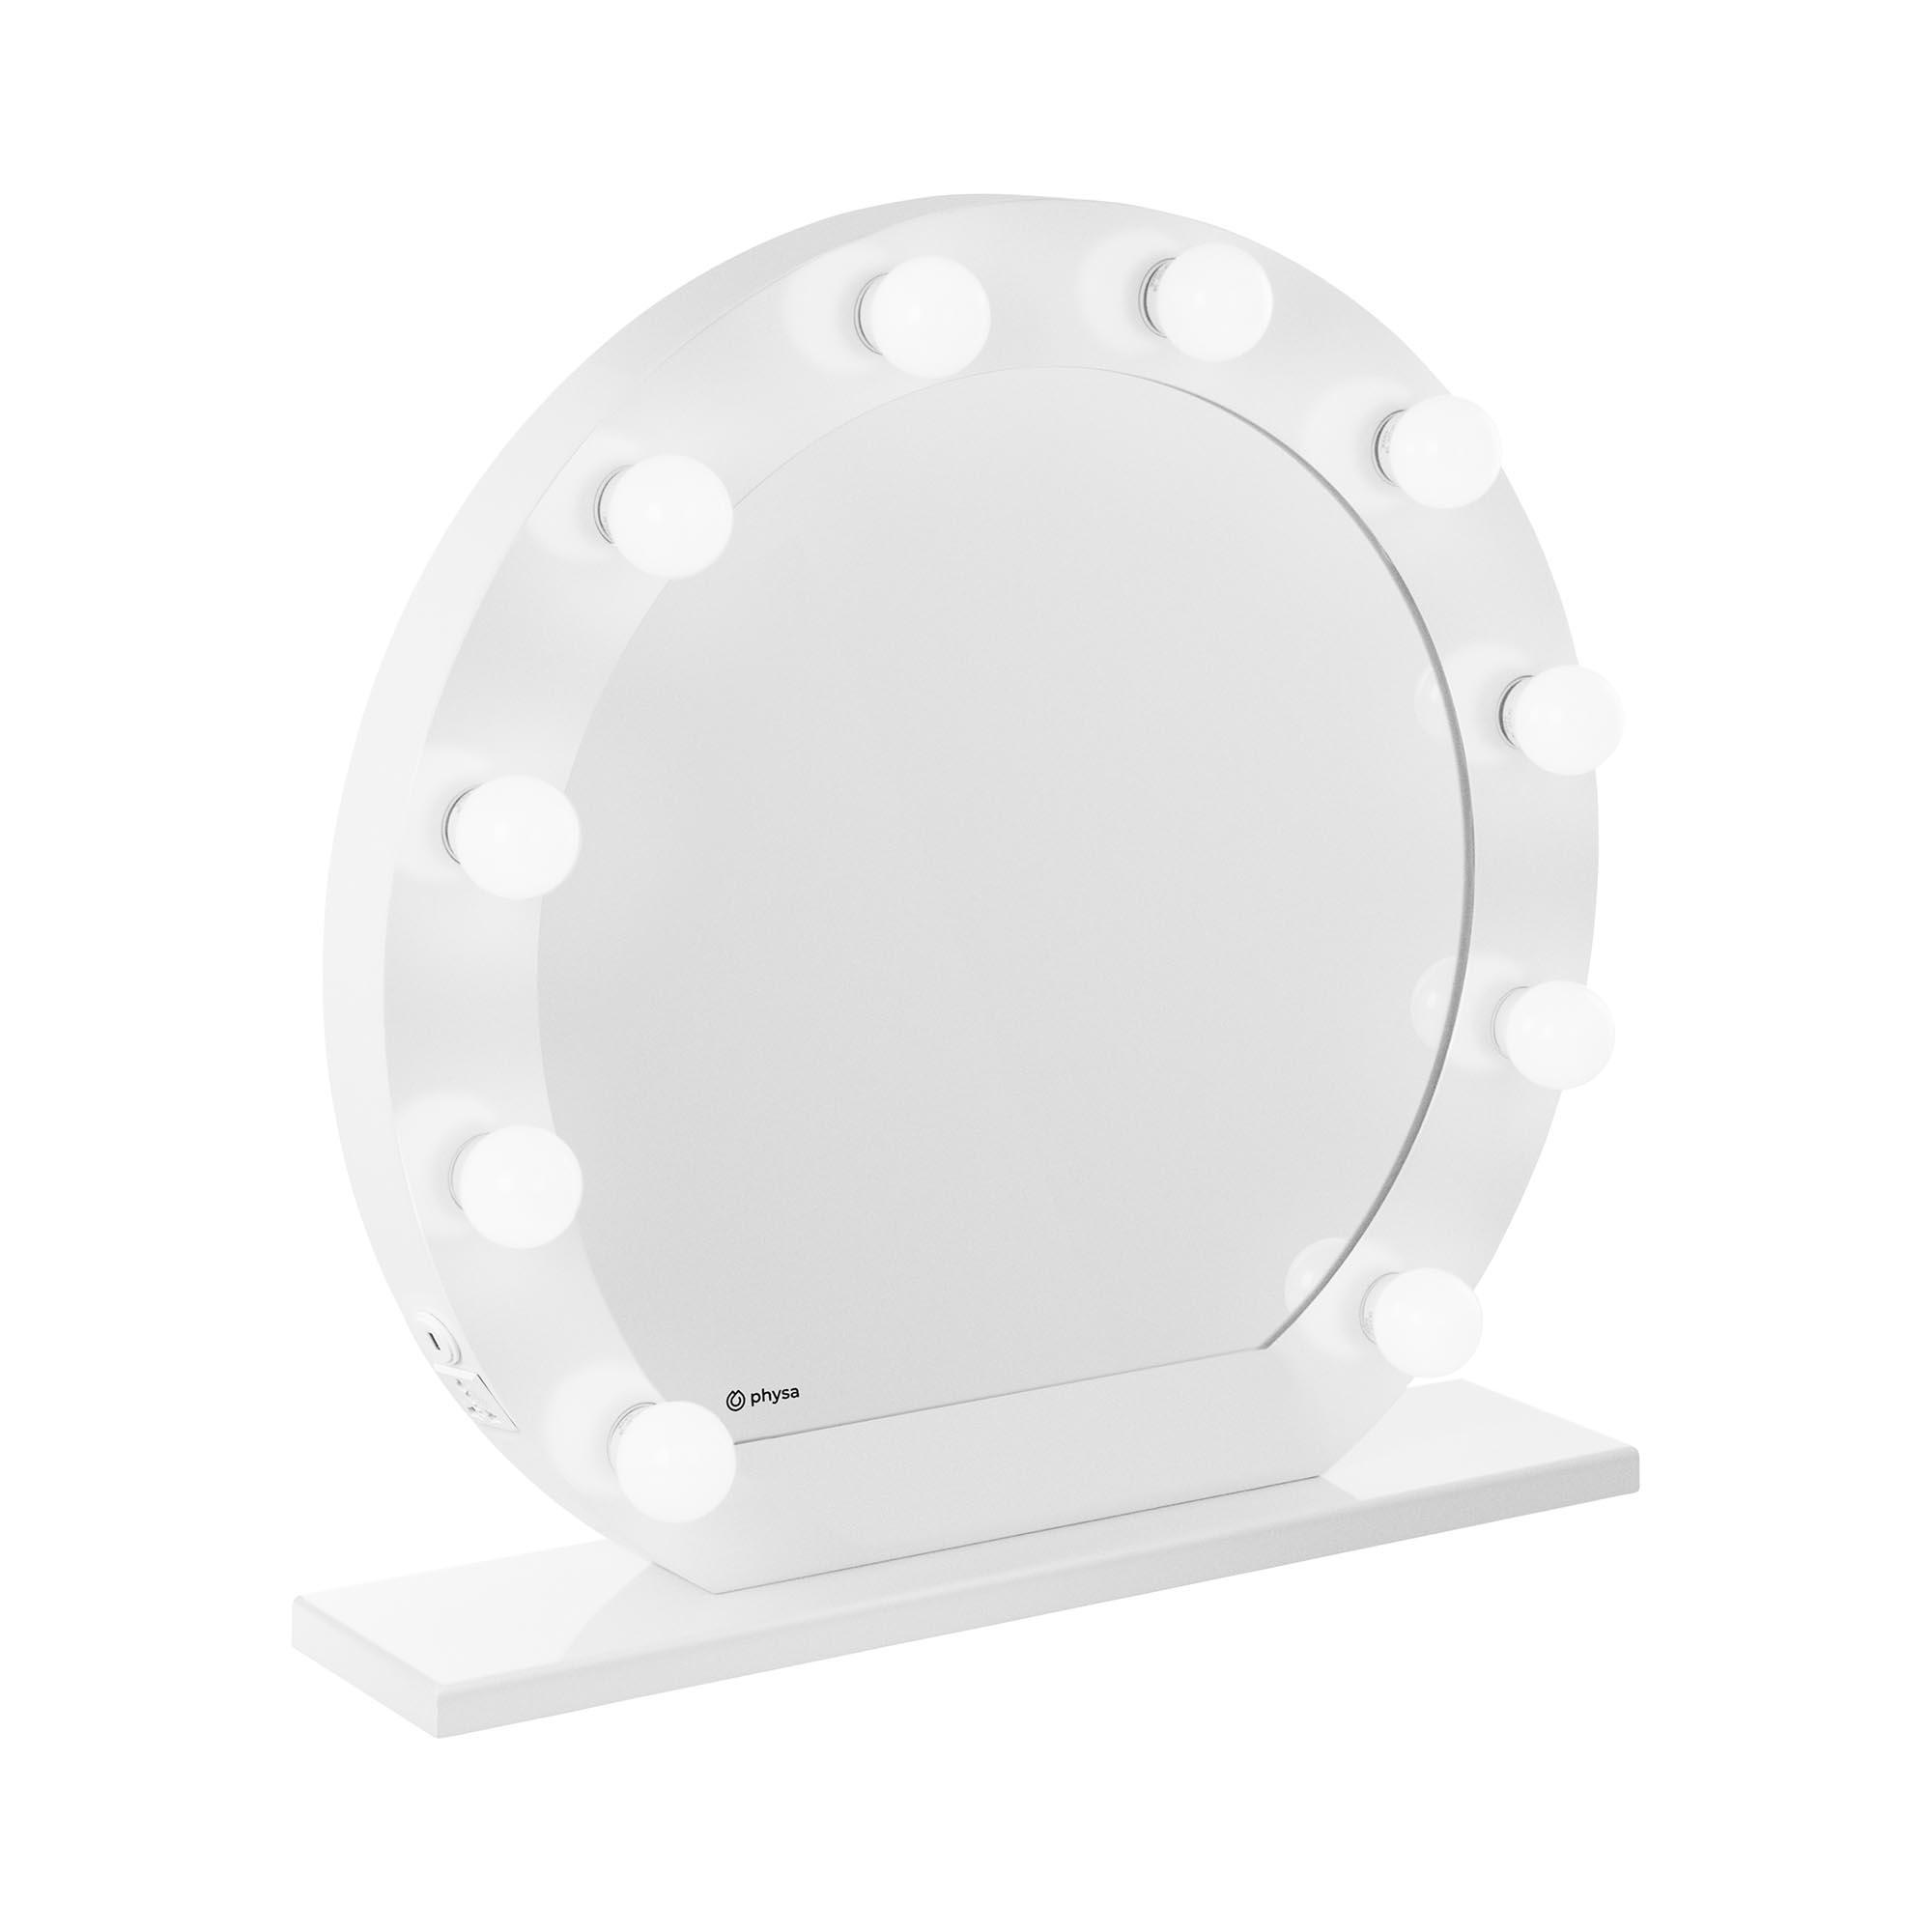 physa Hollywood-Spiegel - weiß - 10 LEDs - rund PHY-CM-12 WHITE